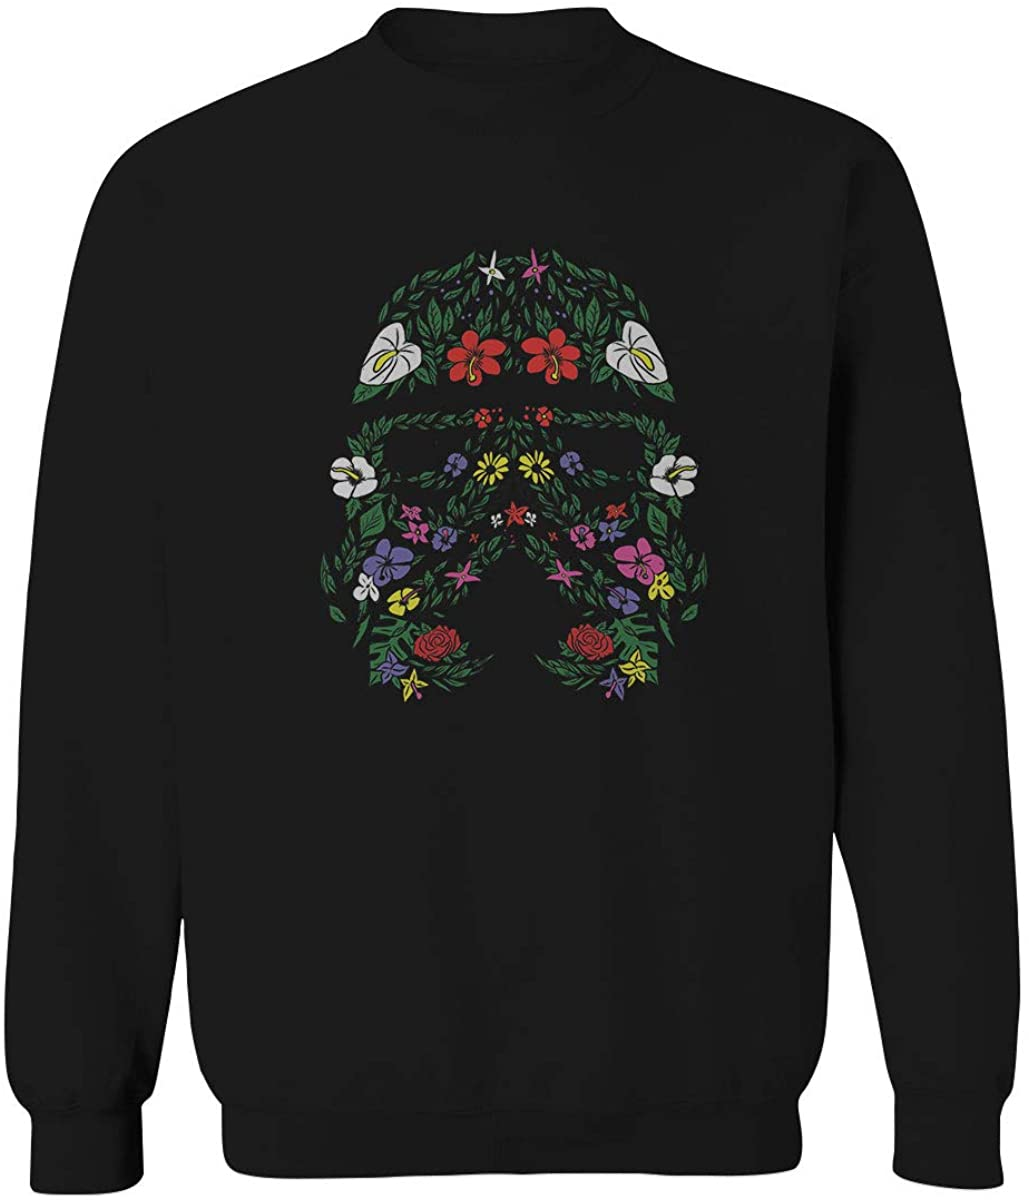 Cool Graphic Floral Tropical Flowers Stormtrooper Street wear Good Vibe Men's Crewneck Sweatshirt